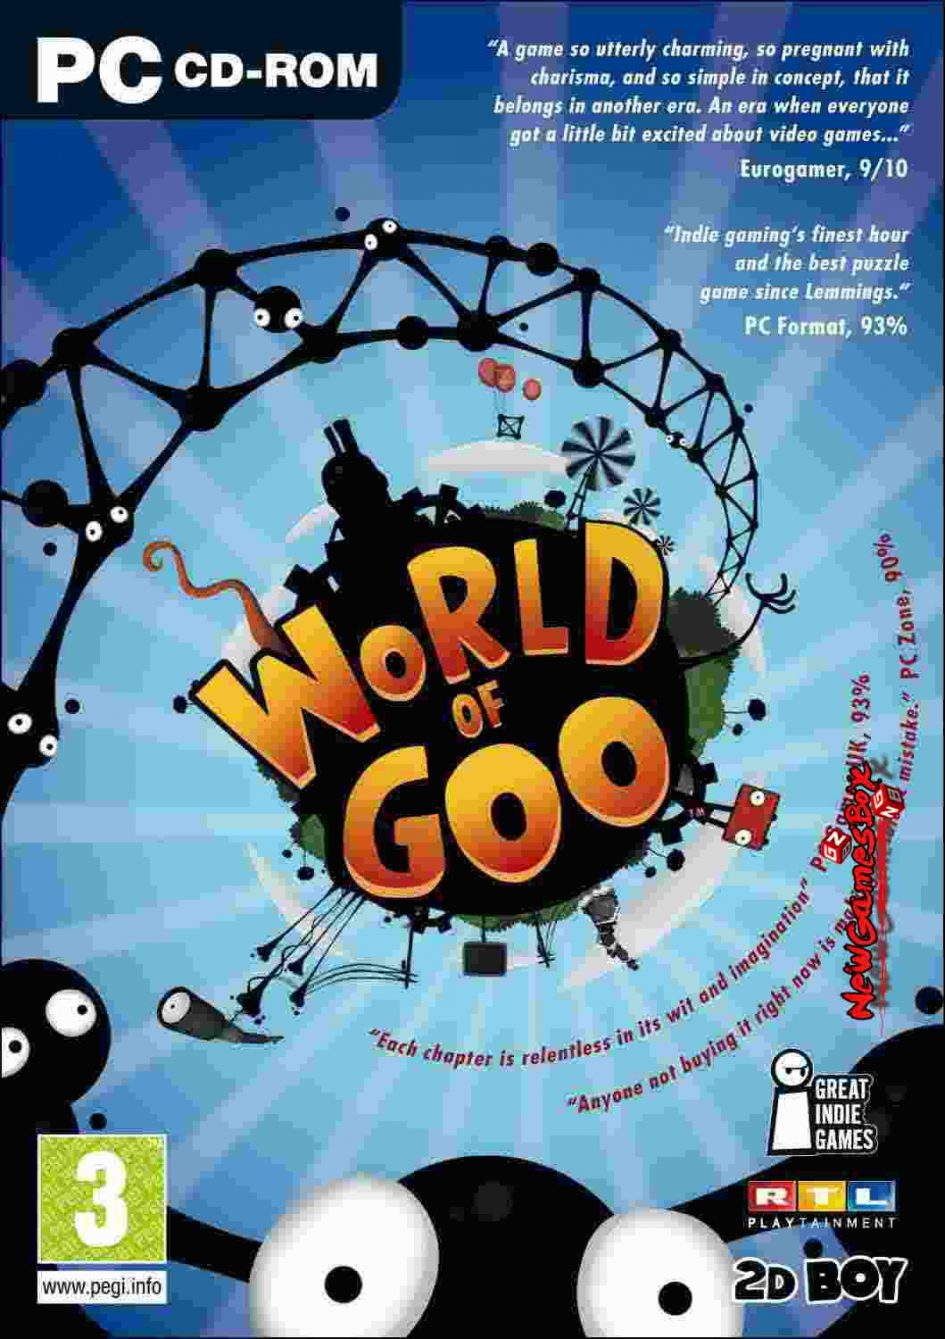 world of goo free download full version pc game setup